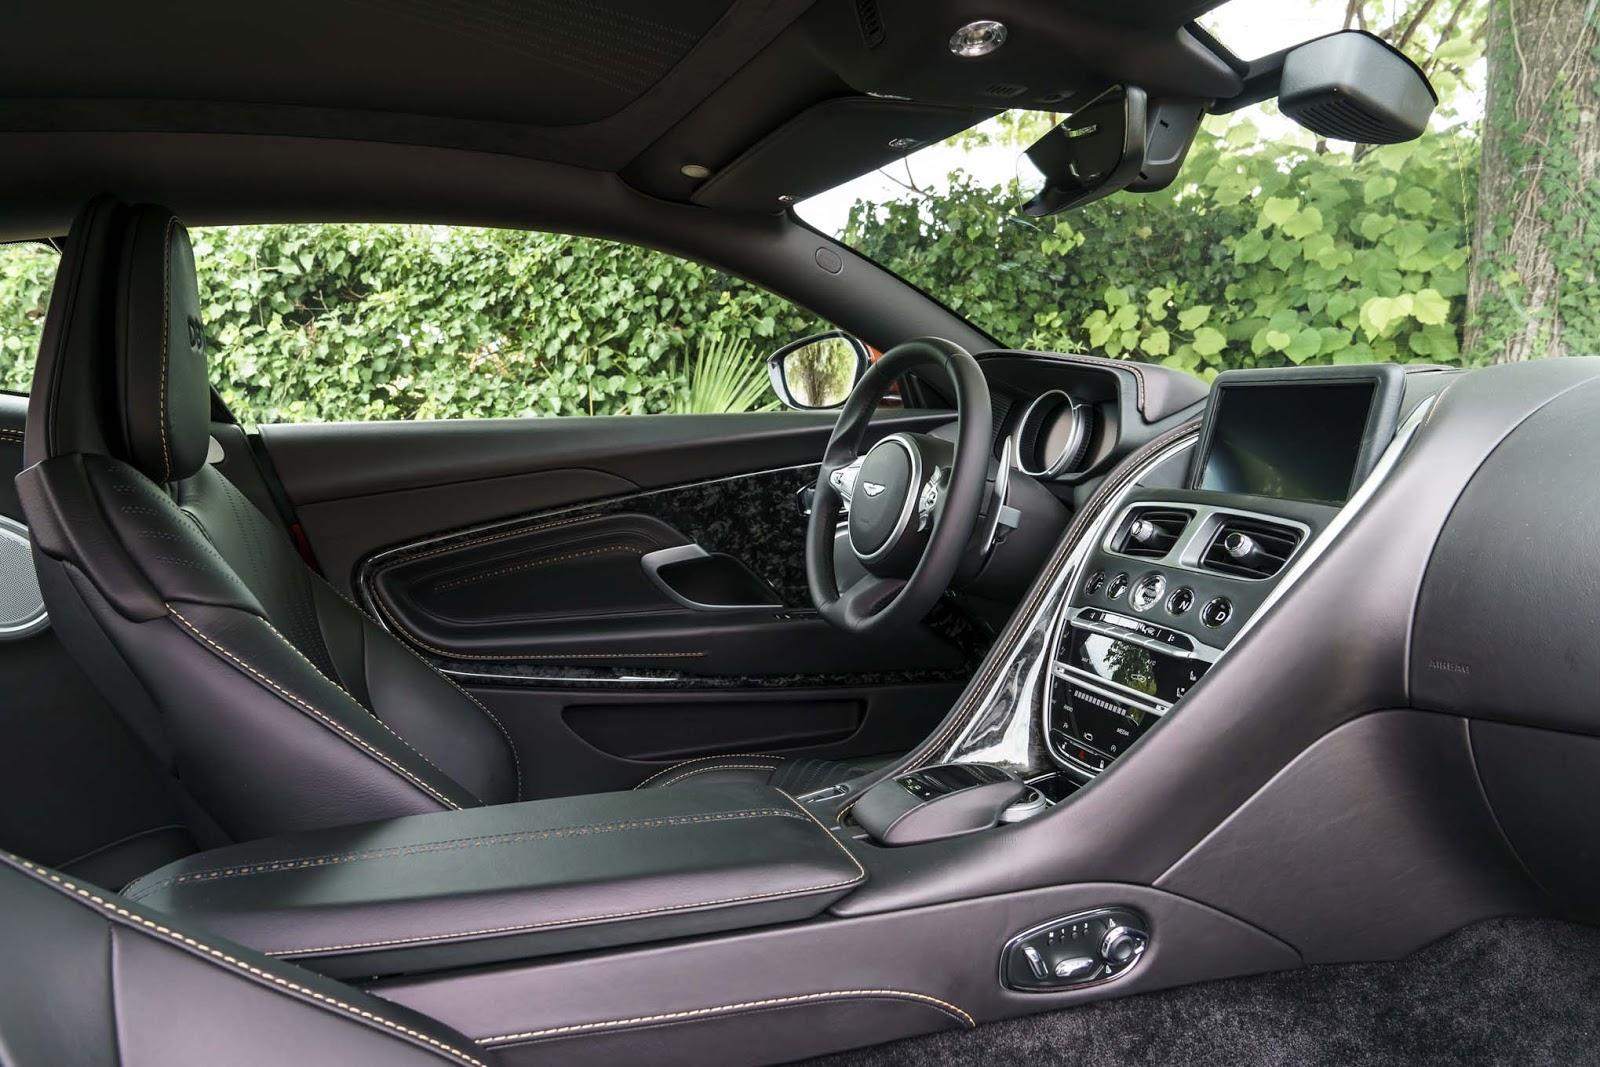 2017 Aston Martin Db11 V8 V12 Convertible Specs Interior Redesign